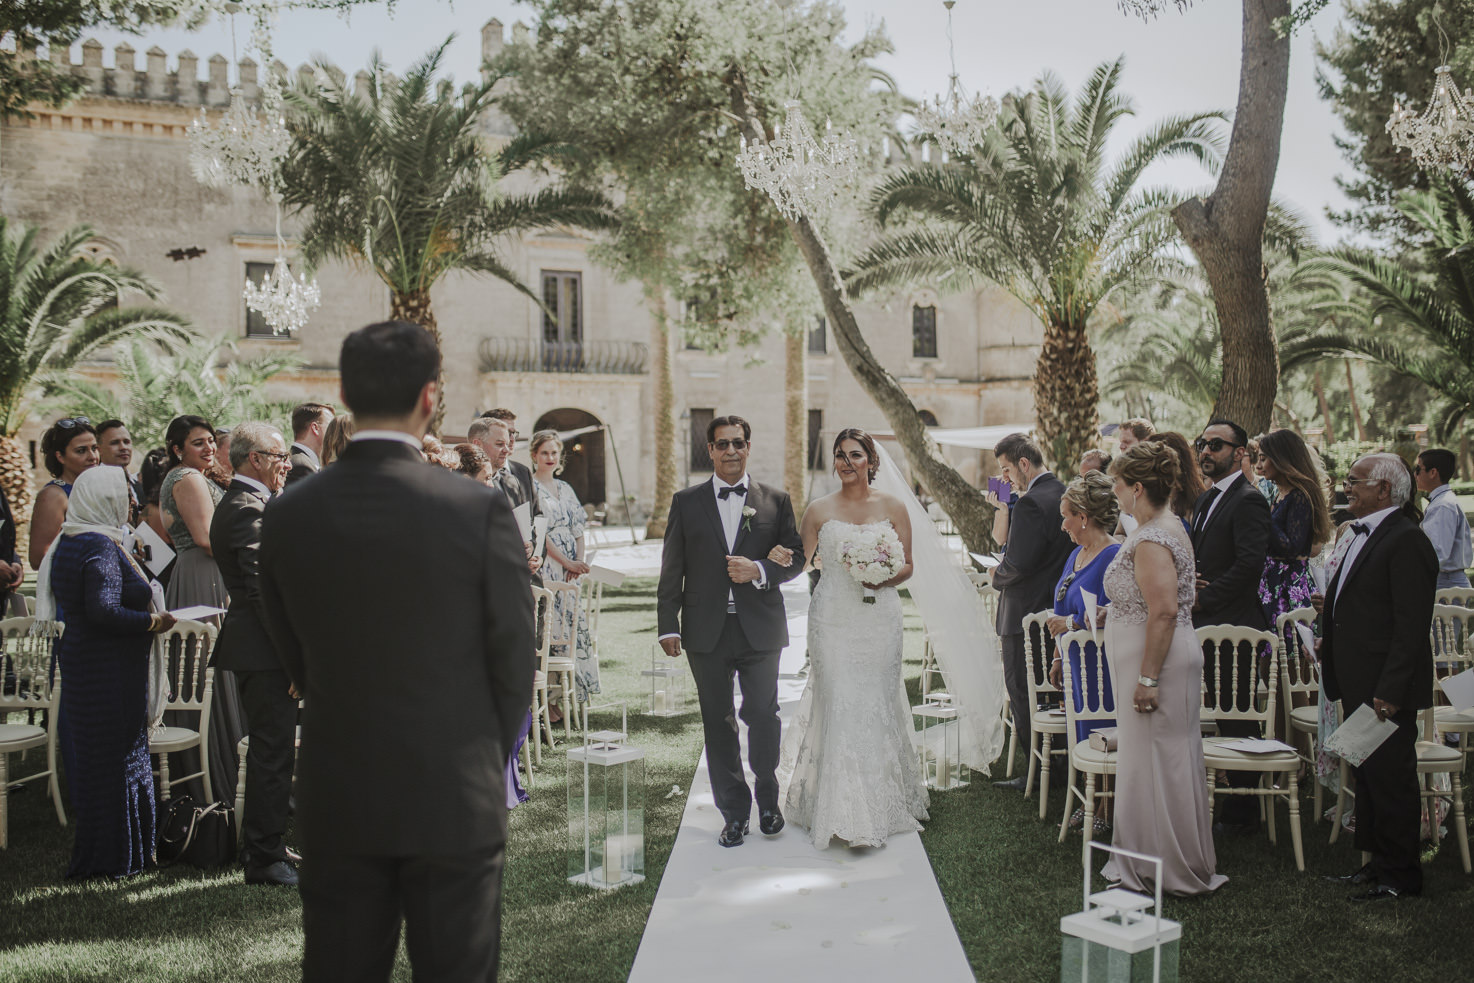 Wedding ceremony at Castello Monaci